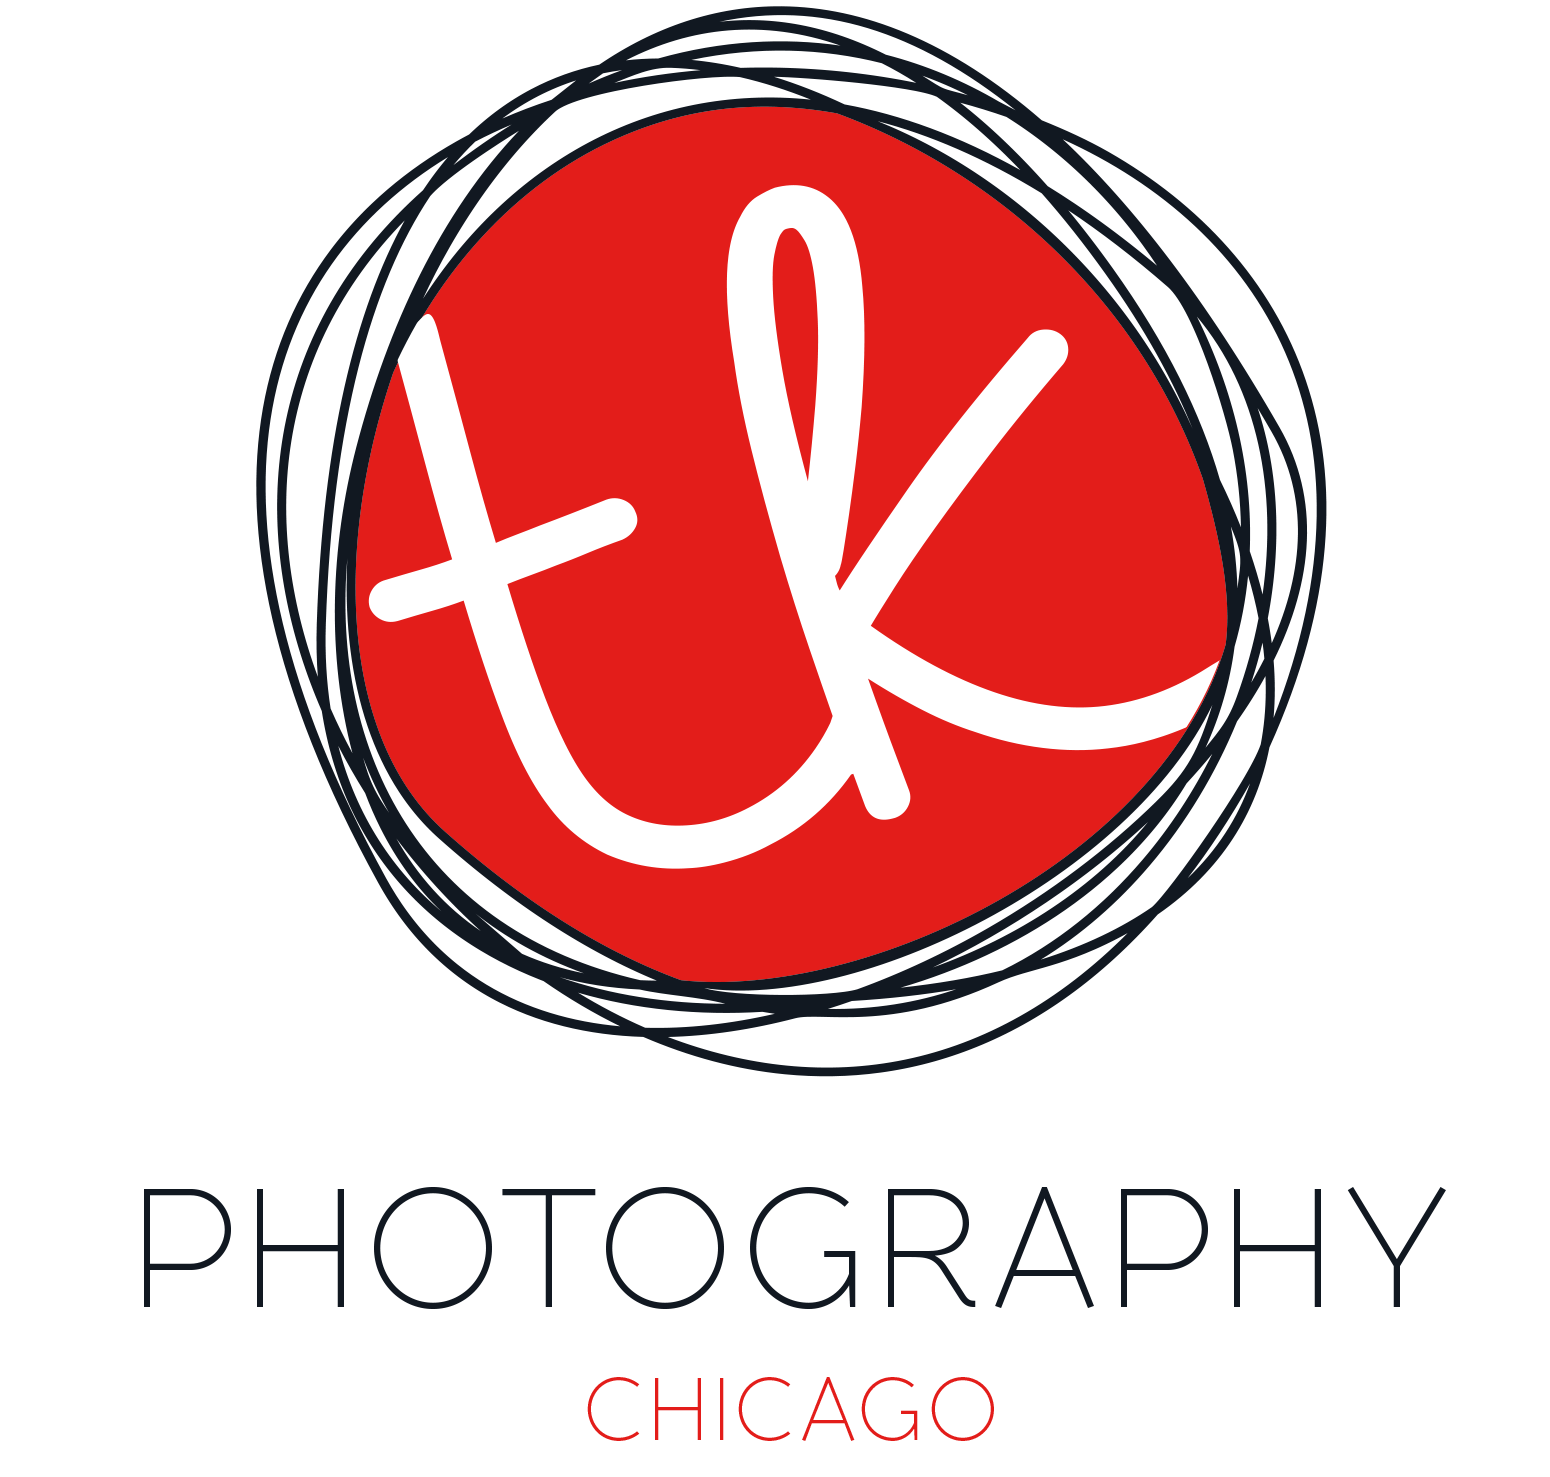 TK Photography Chicago